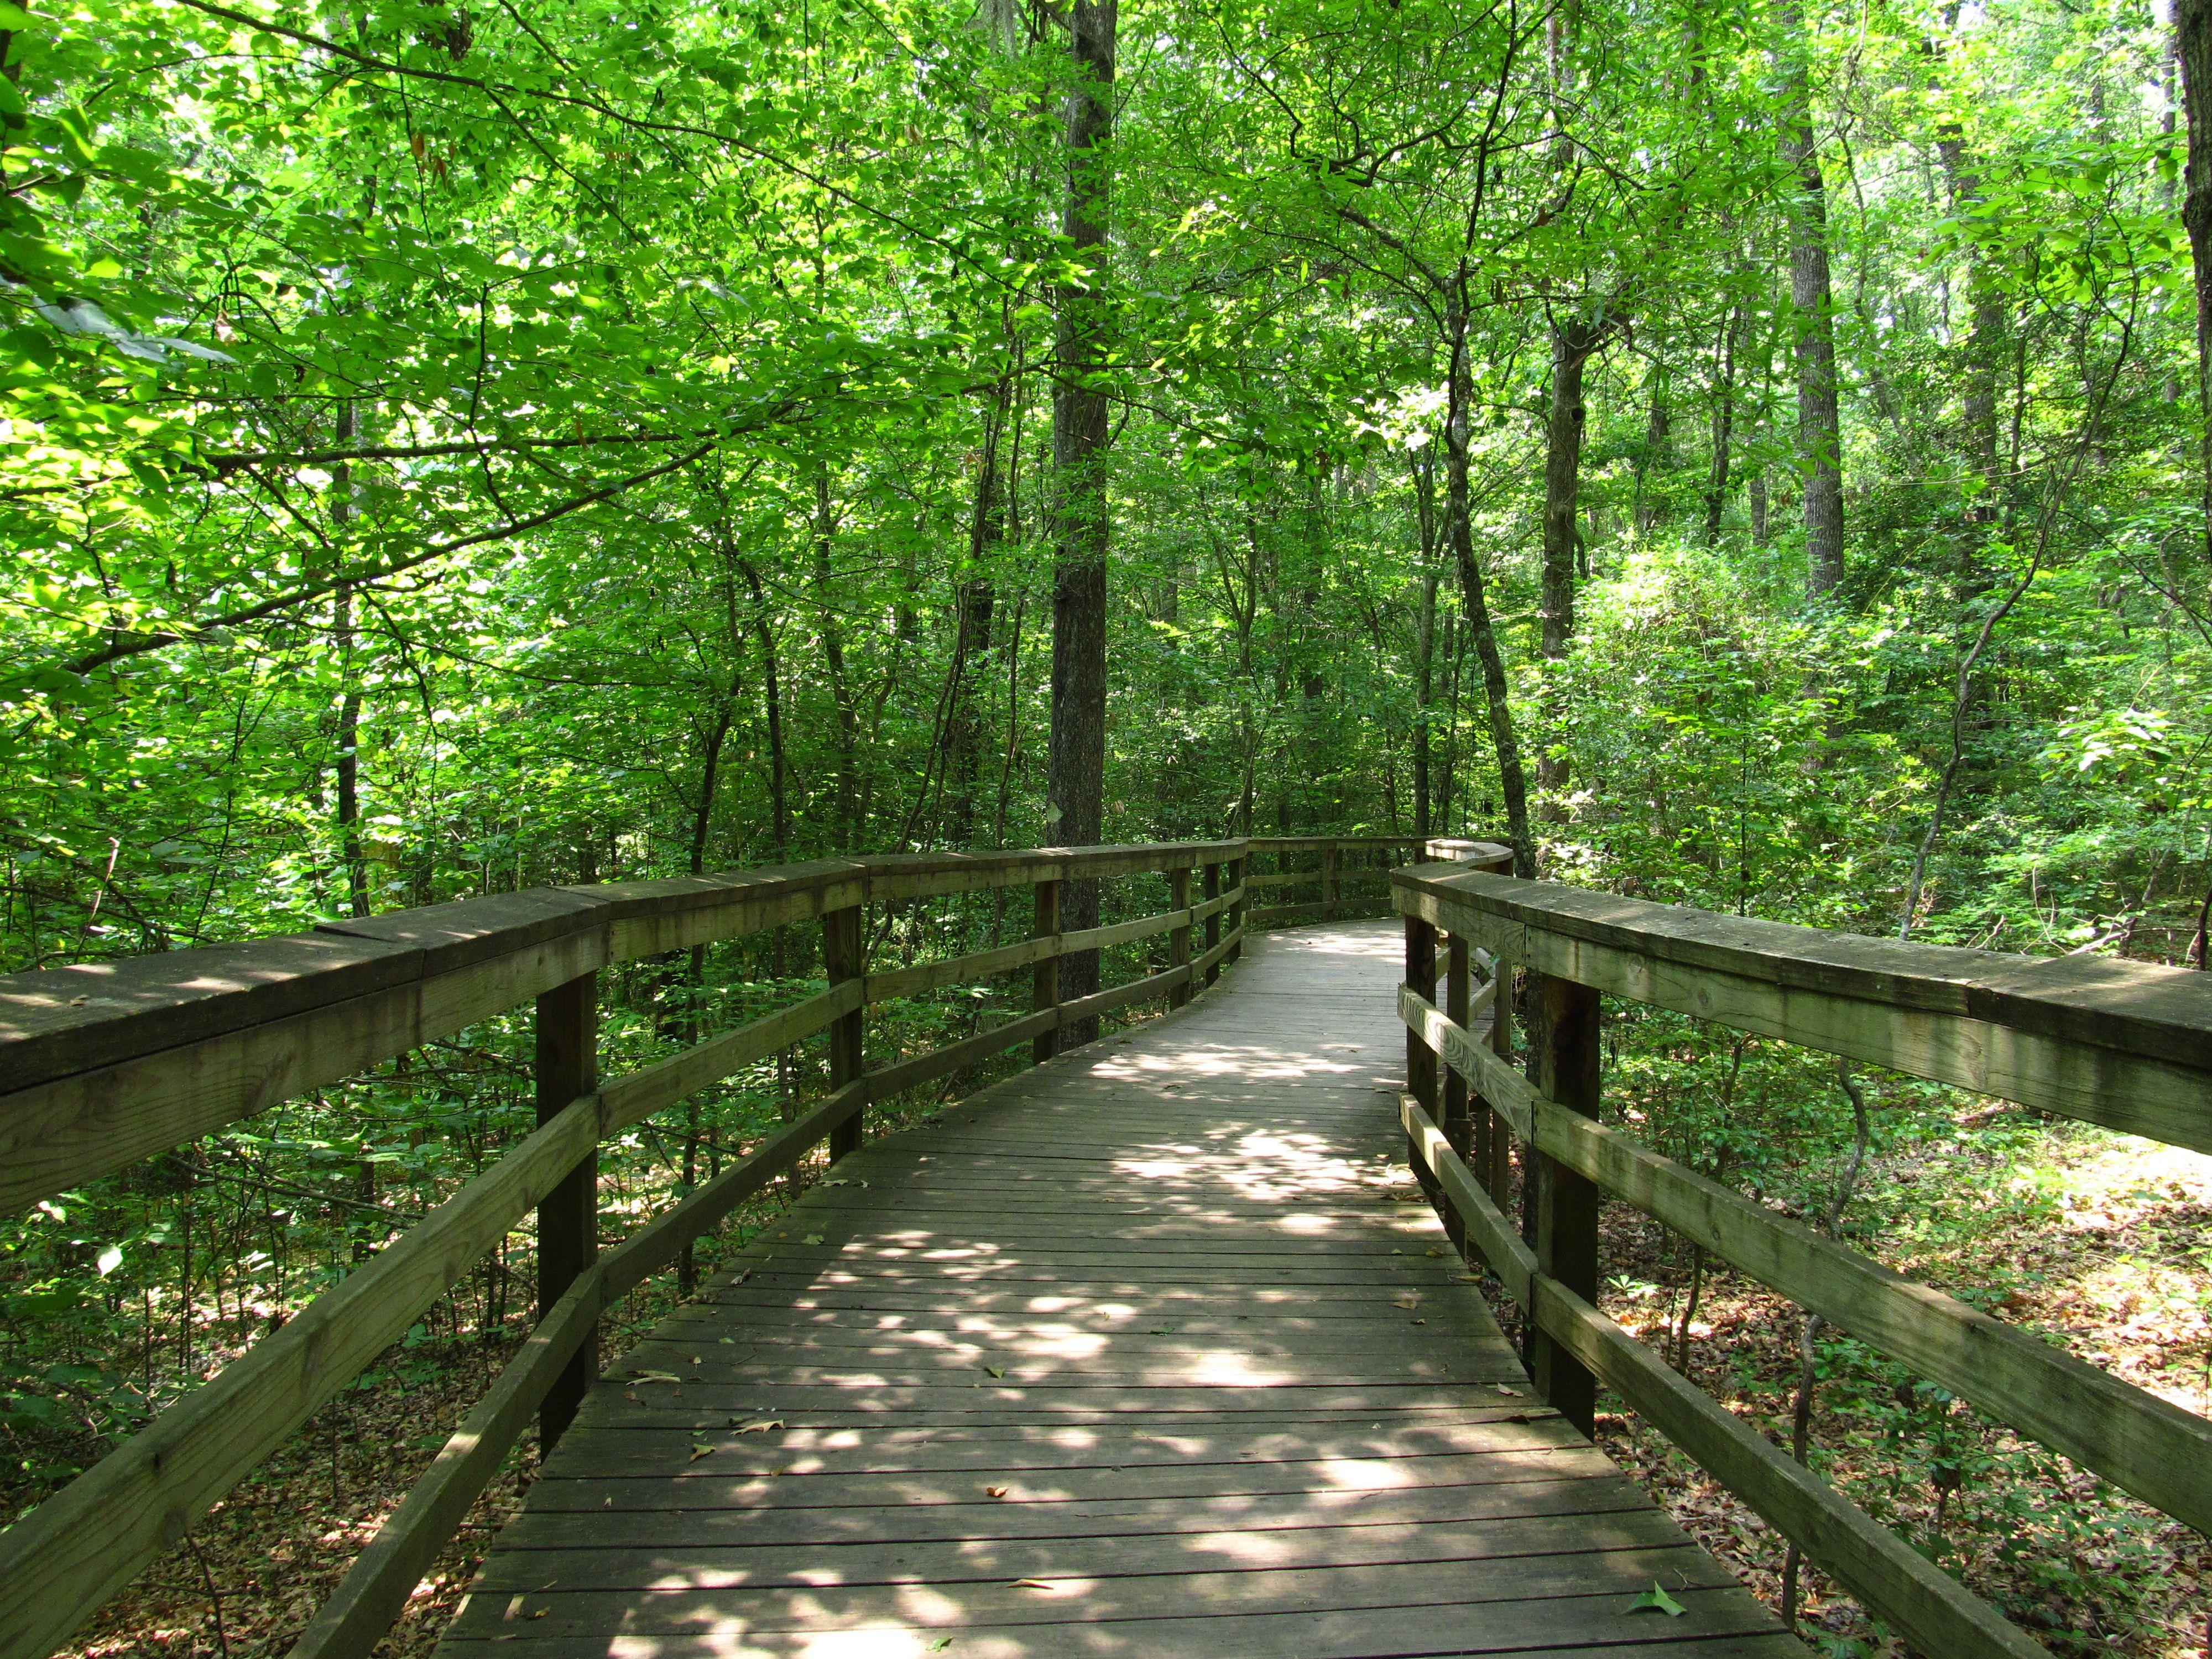 Congaree boardwalk trail